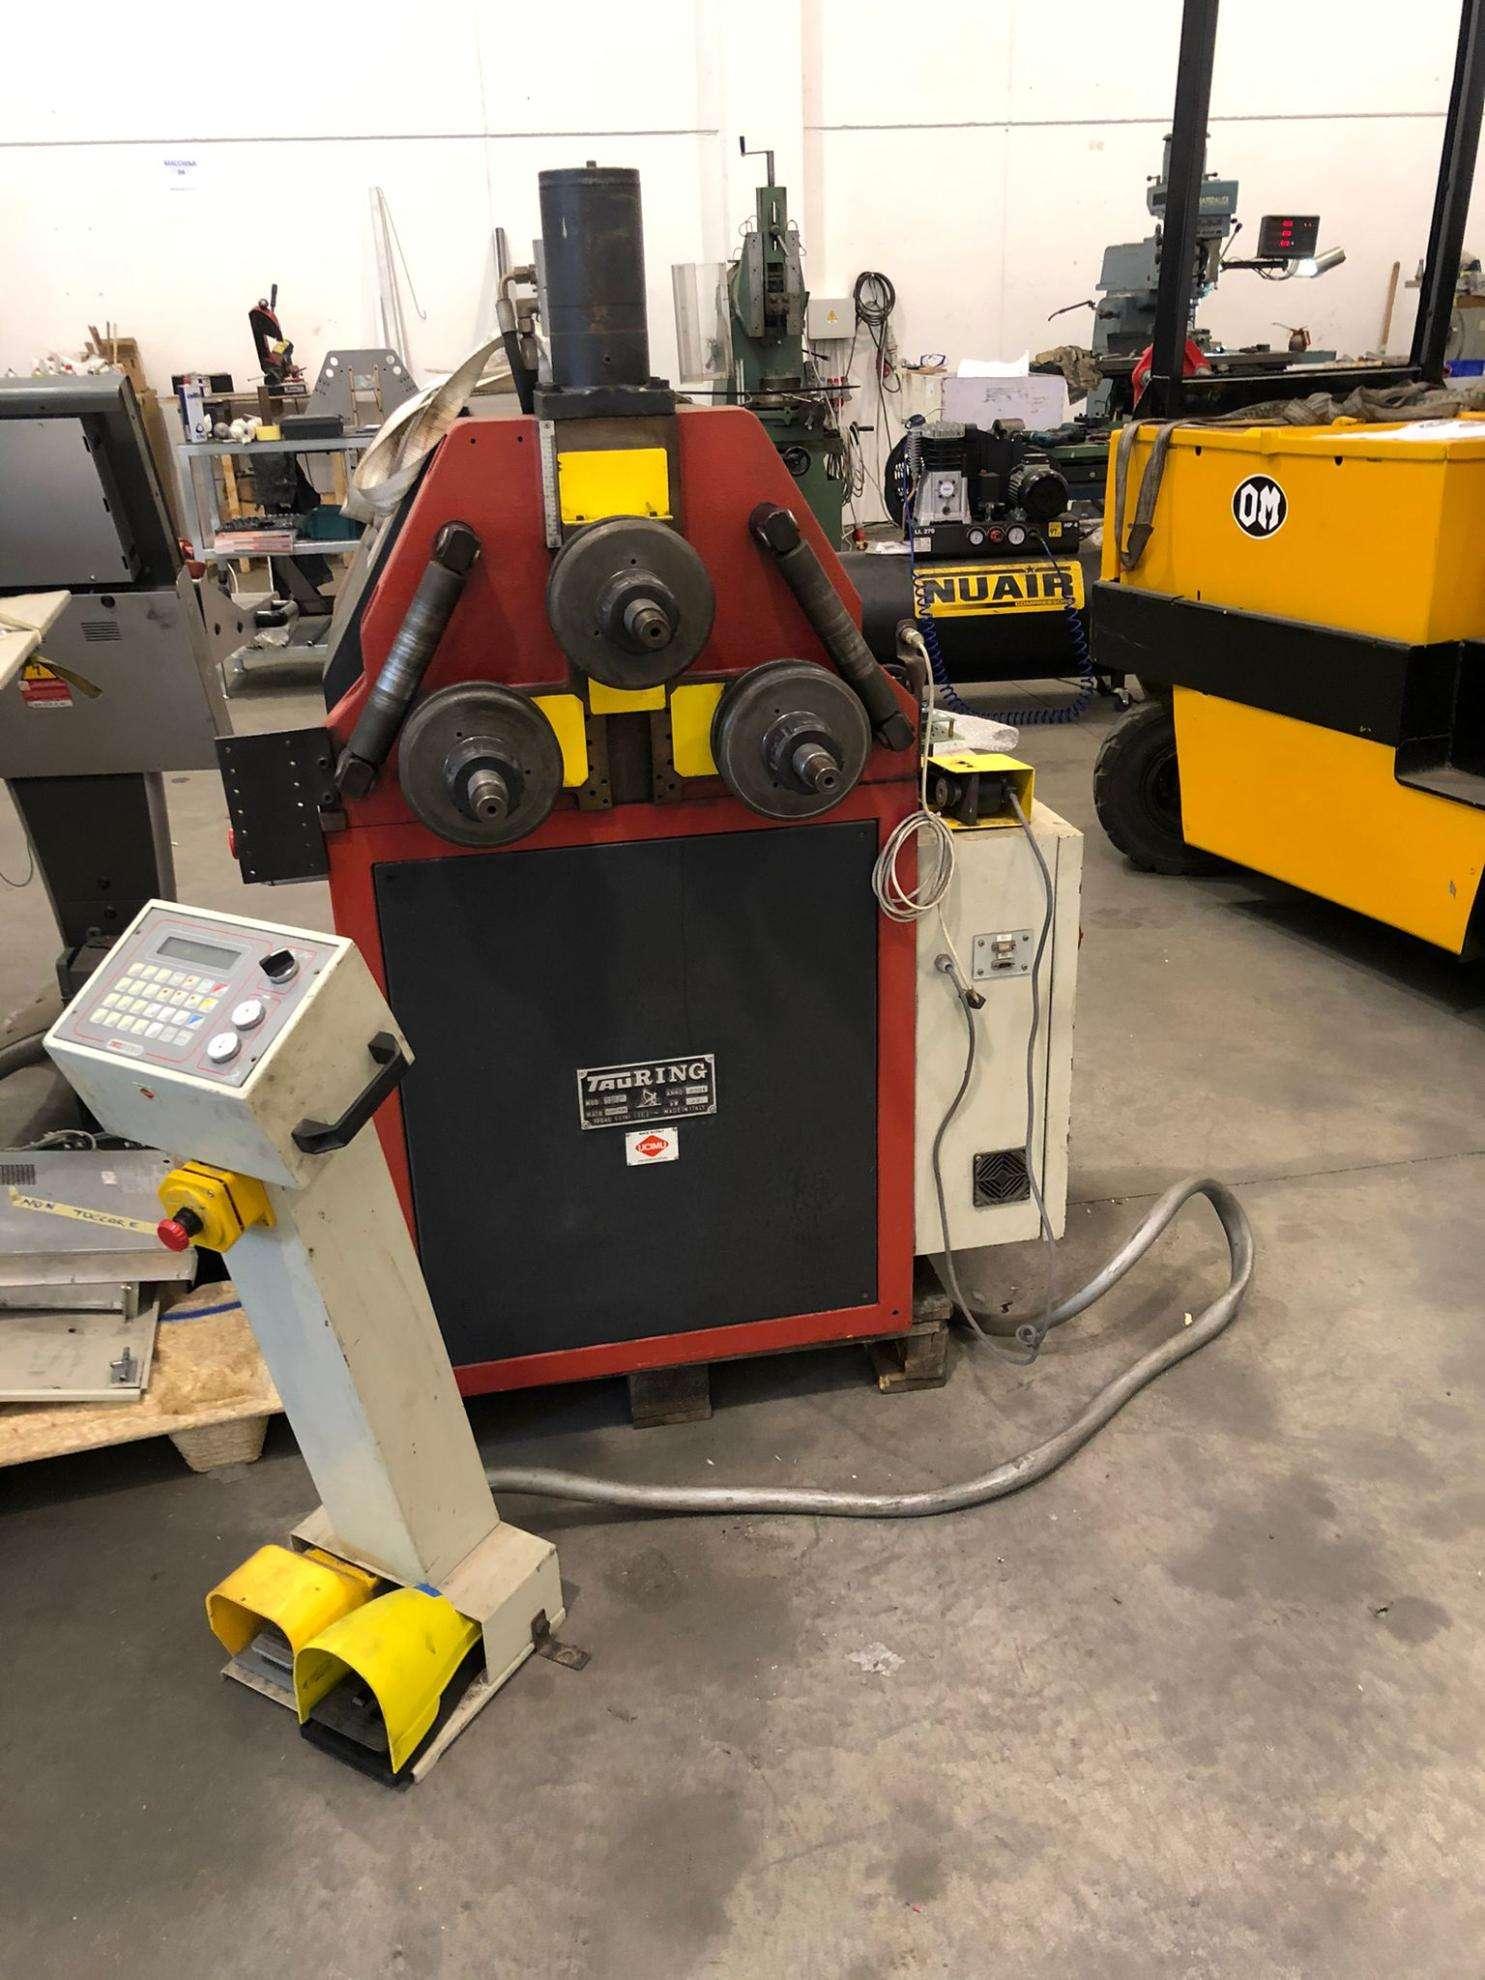 TAURING DELTA 50 CNC-C Image